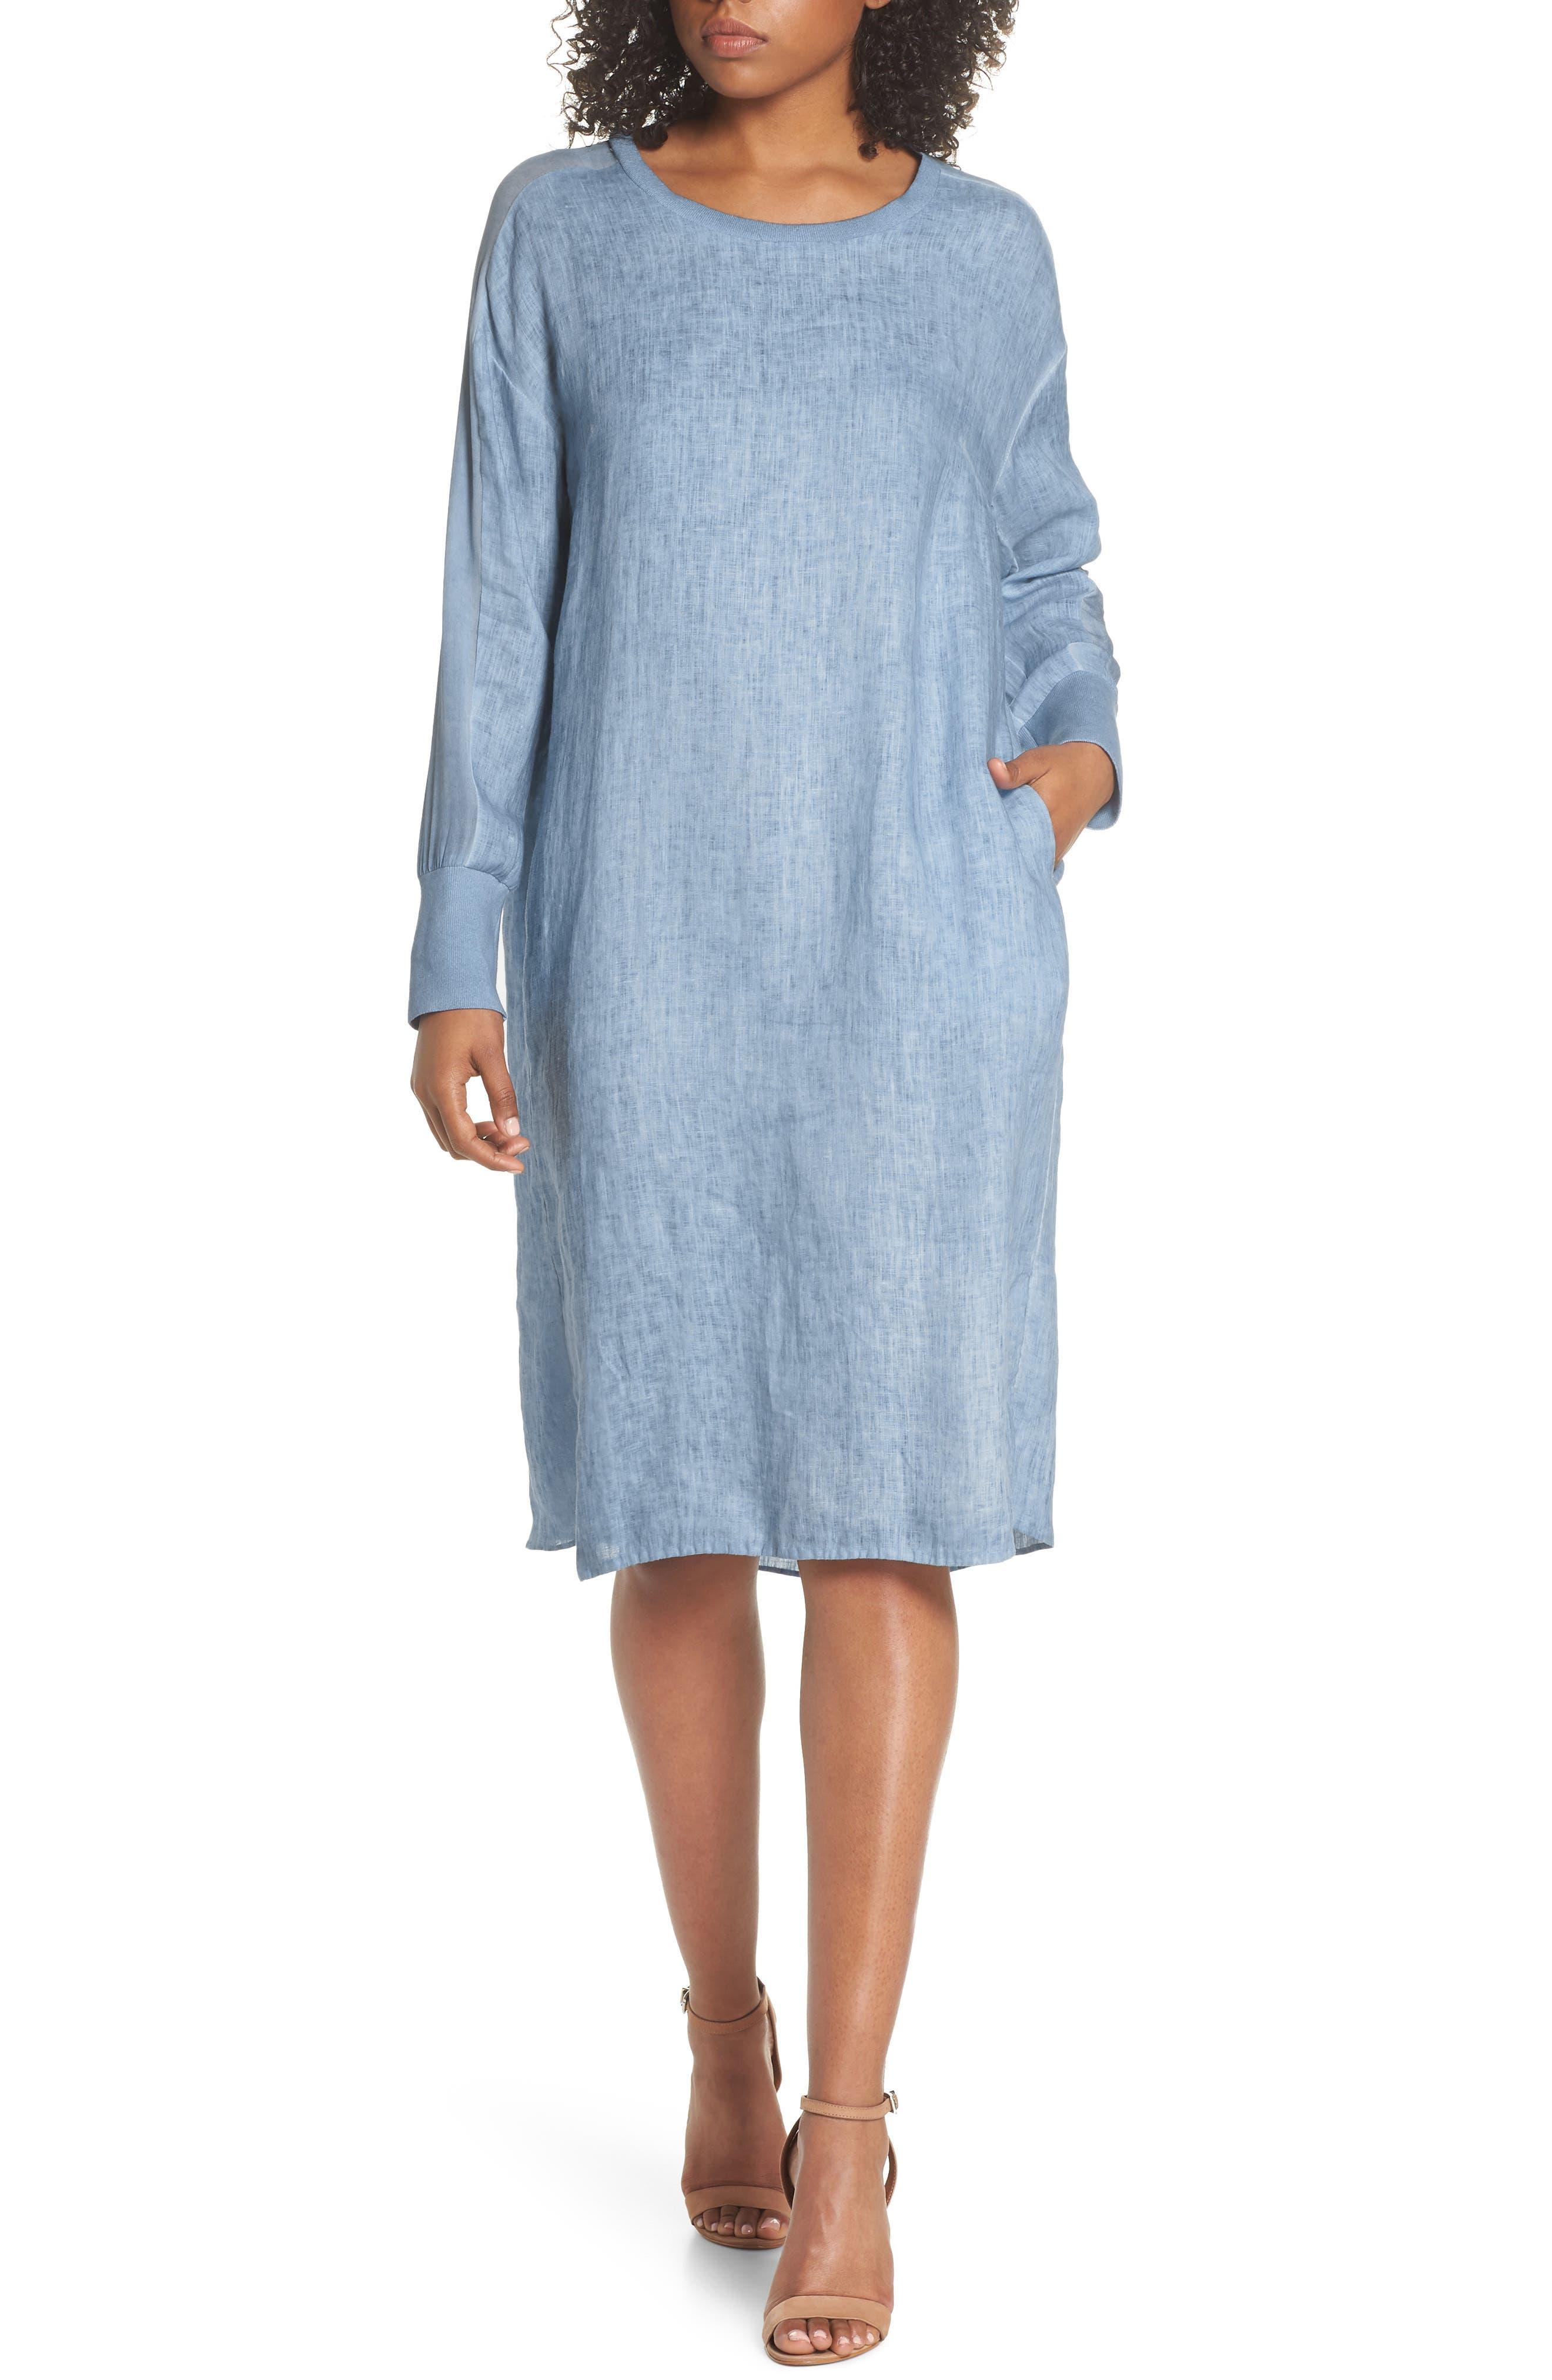 Rata Linen Shift Dress,                             Main thumbnail 1, color,                             400